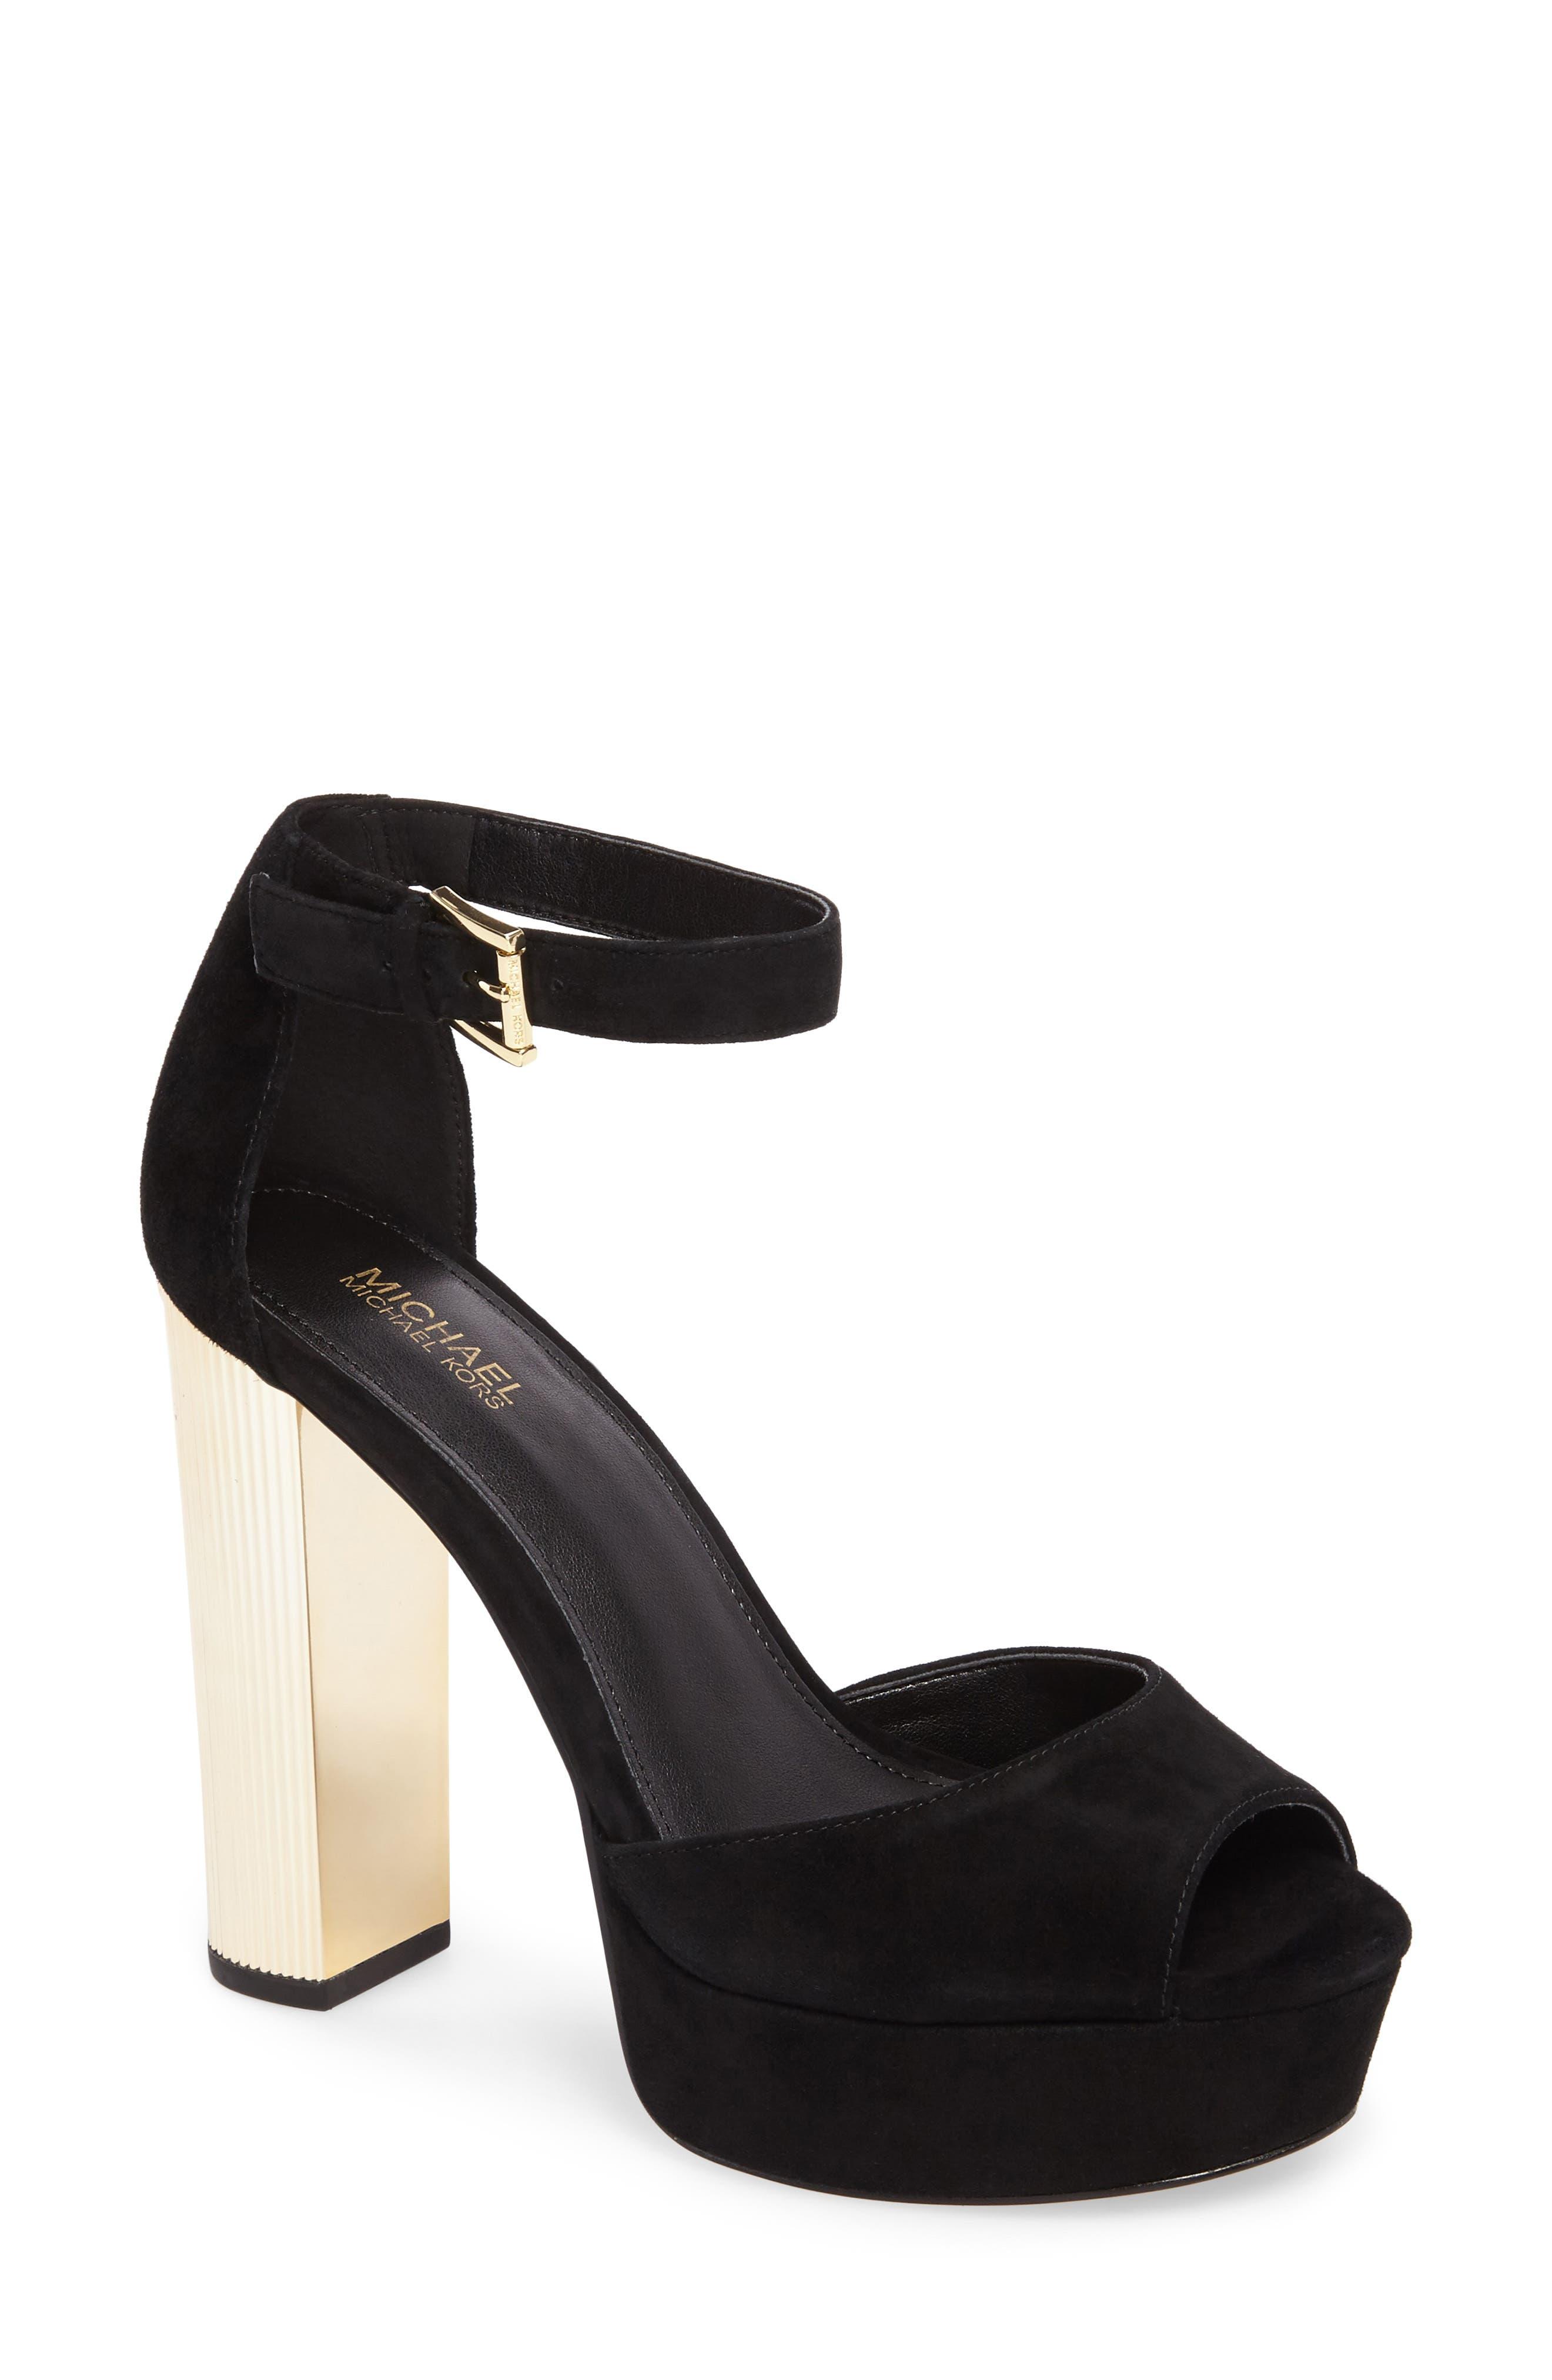 Alternate Image 1 Selected - MICHAEL Michael Kors Paloma Metallic Heel Platform Sandal (Women)